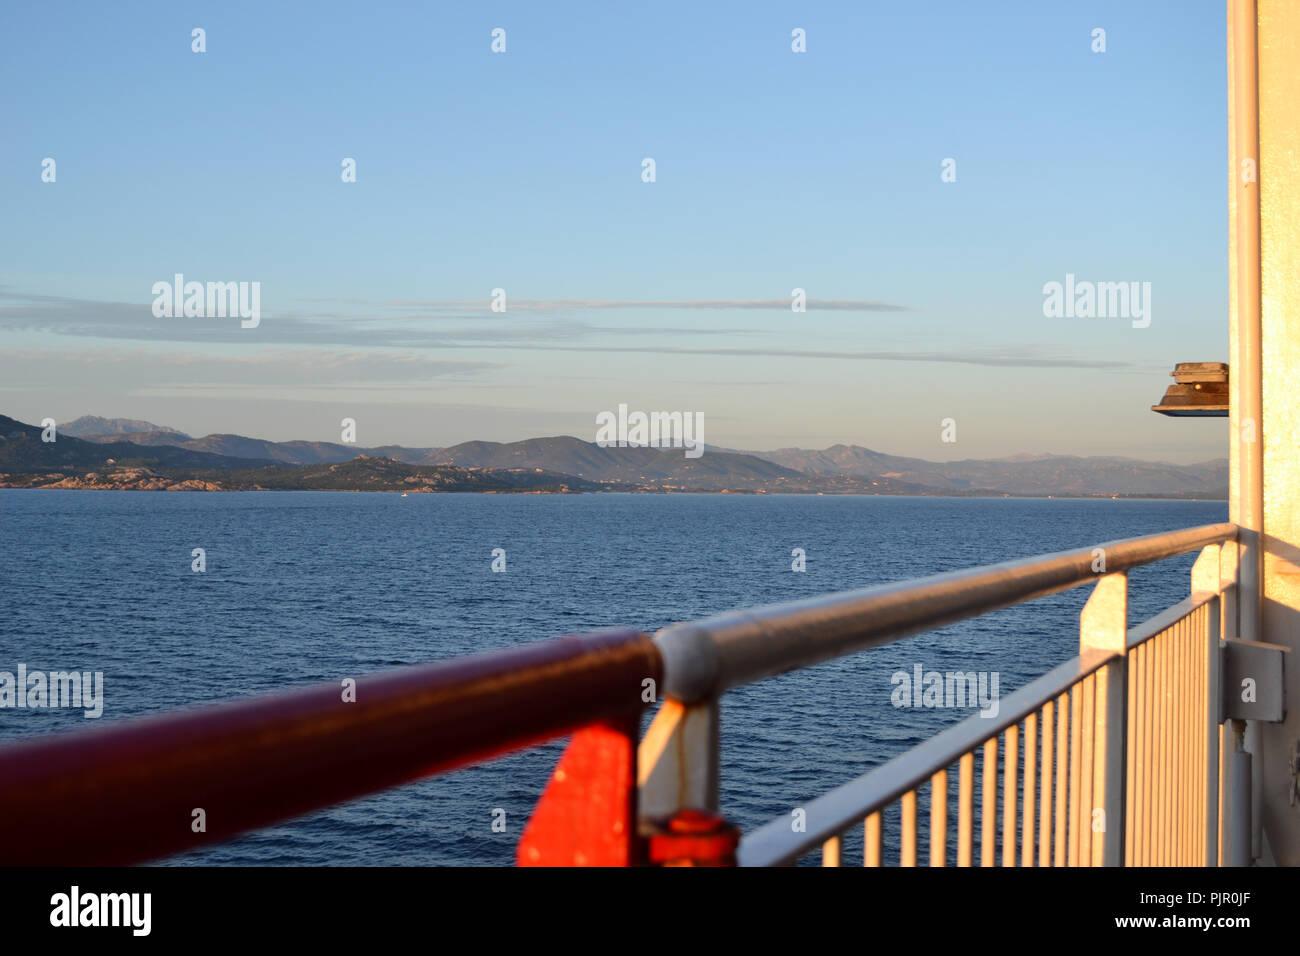 Cruise ship arriving to Olbia harbour, Sardinia island, morning scene - Stock Image